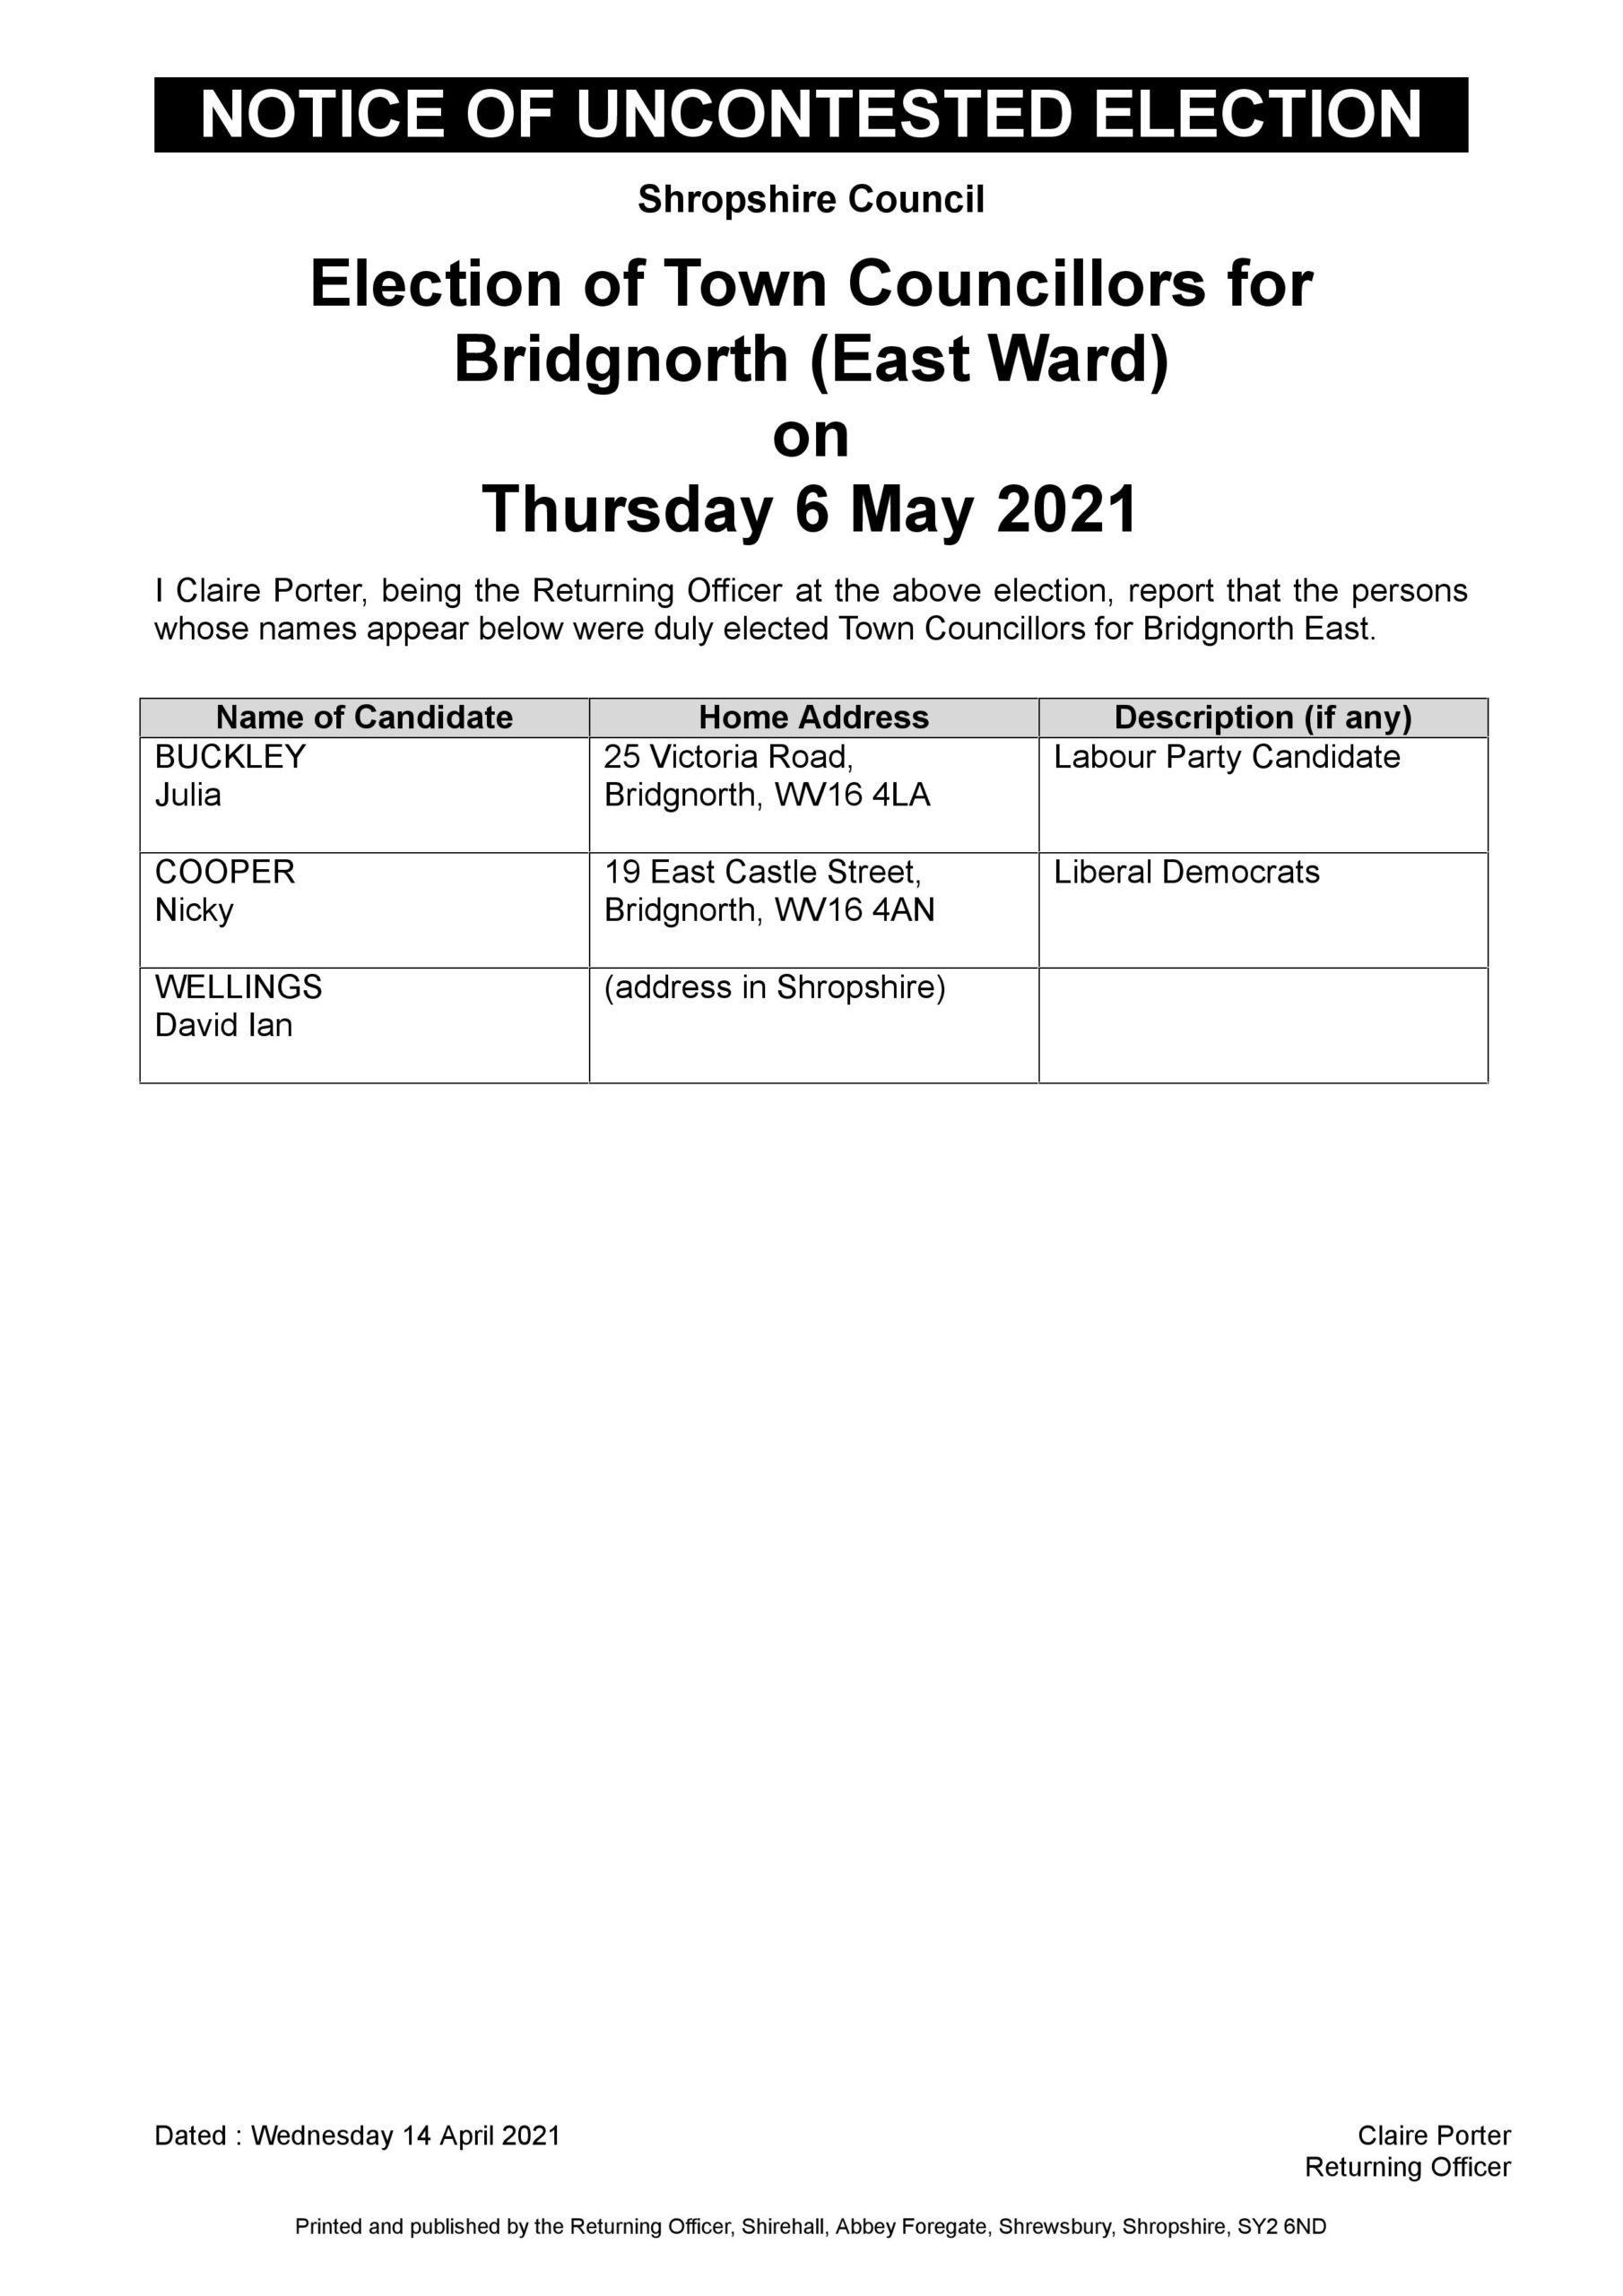 Uncontested Election Bridgnorth East